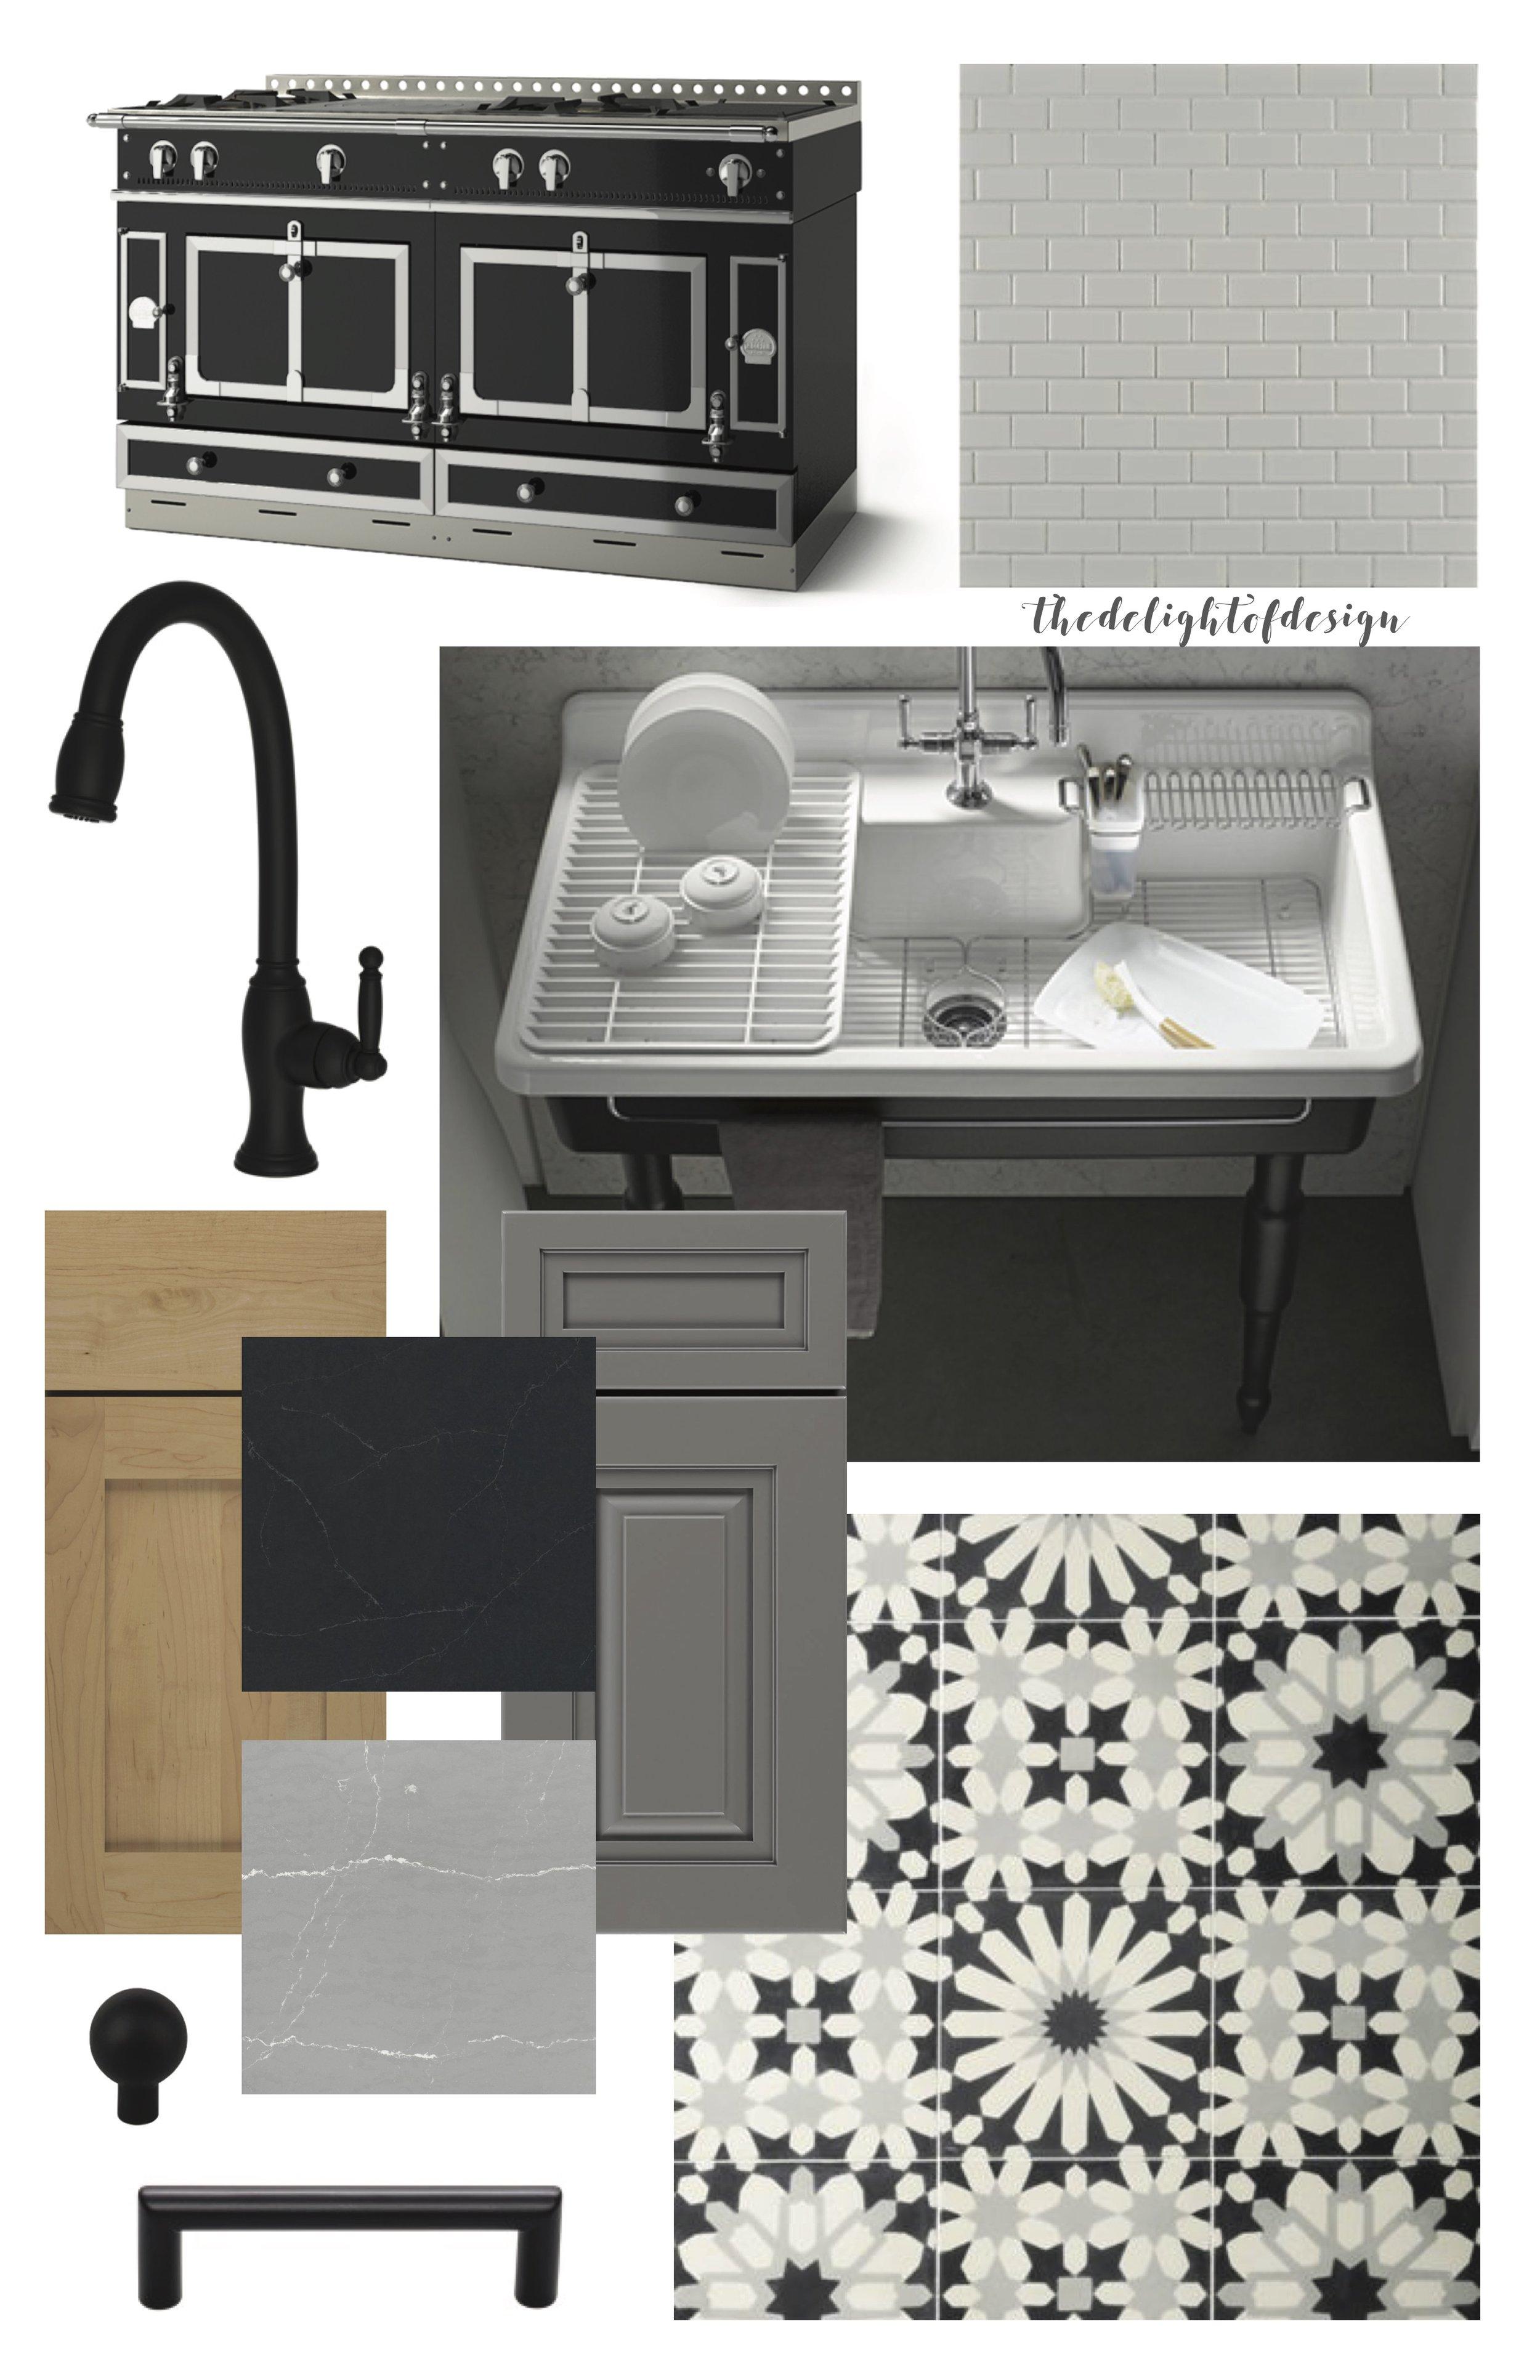 kitchenconcept.jpg